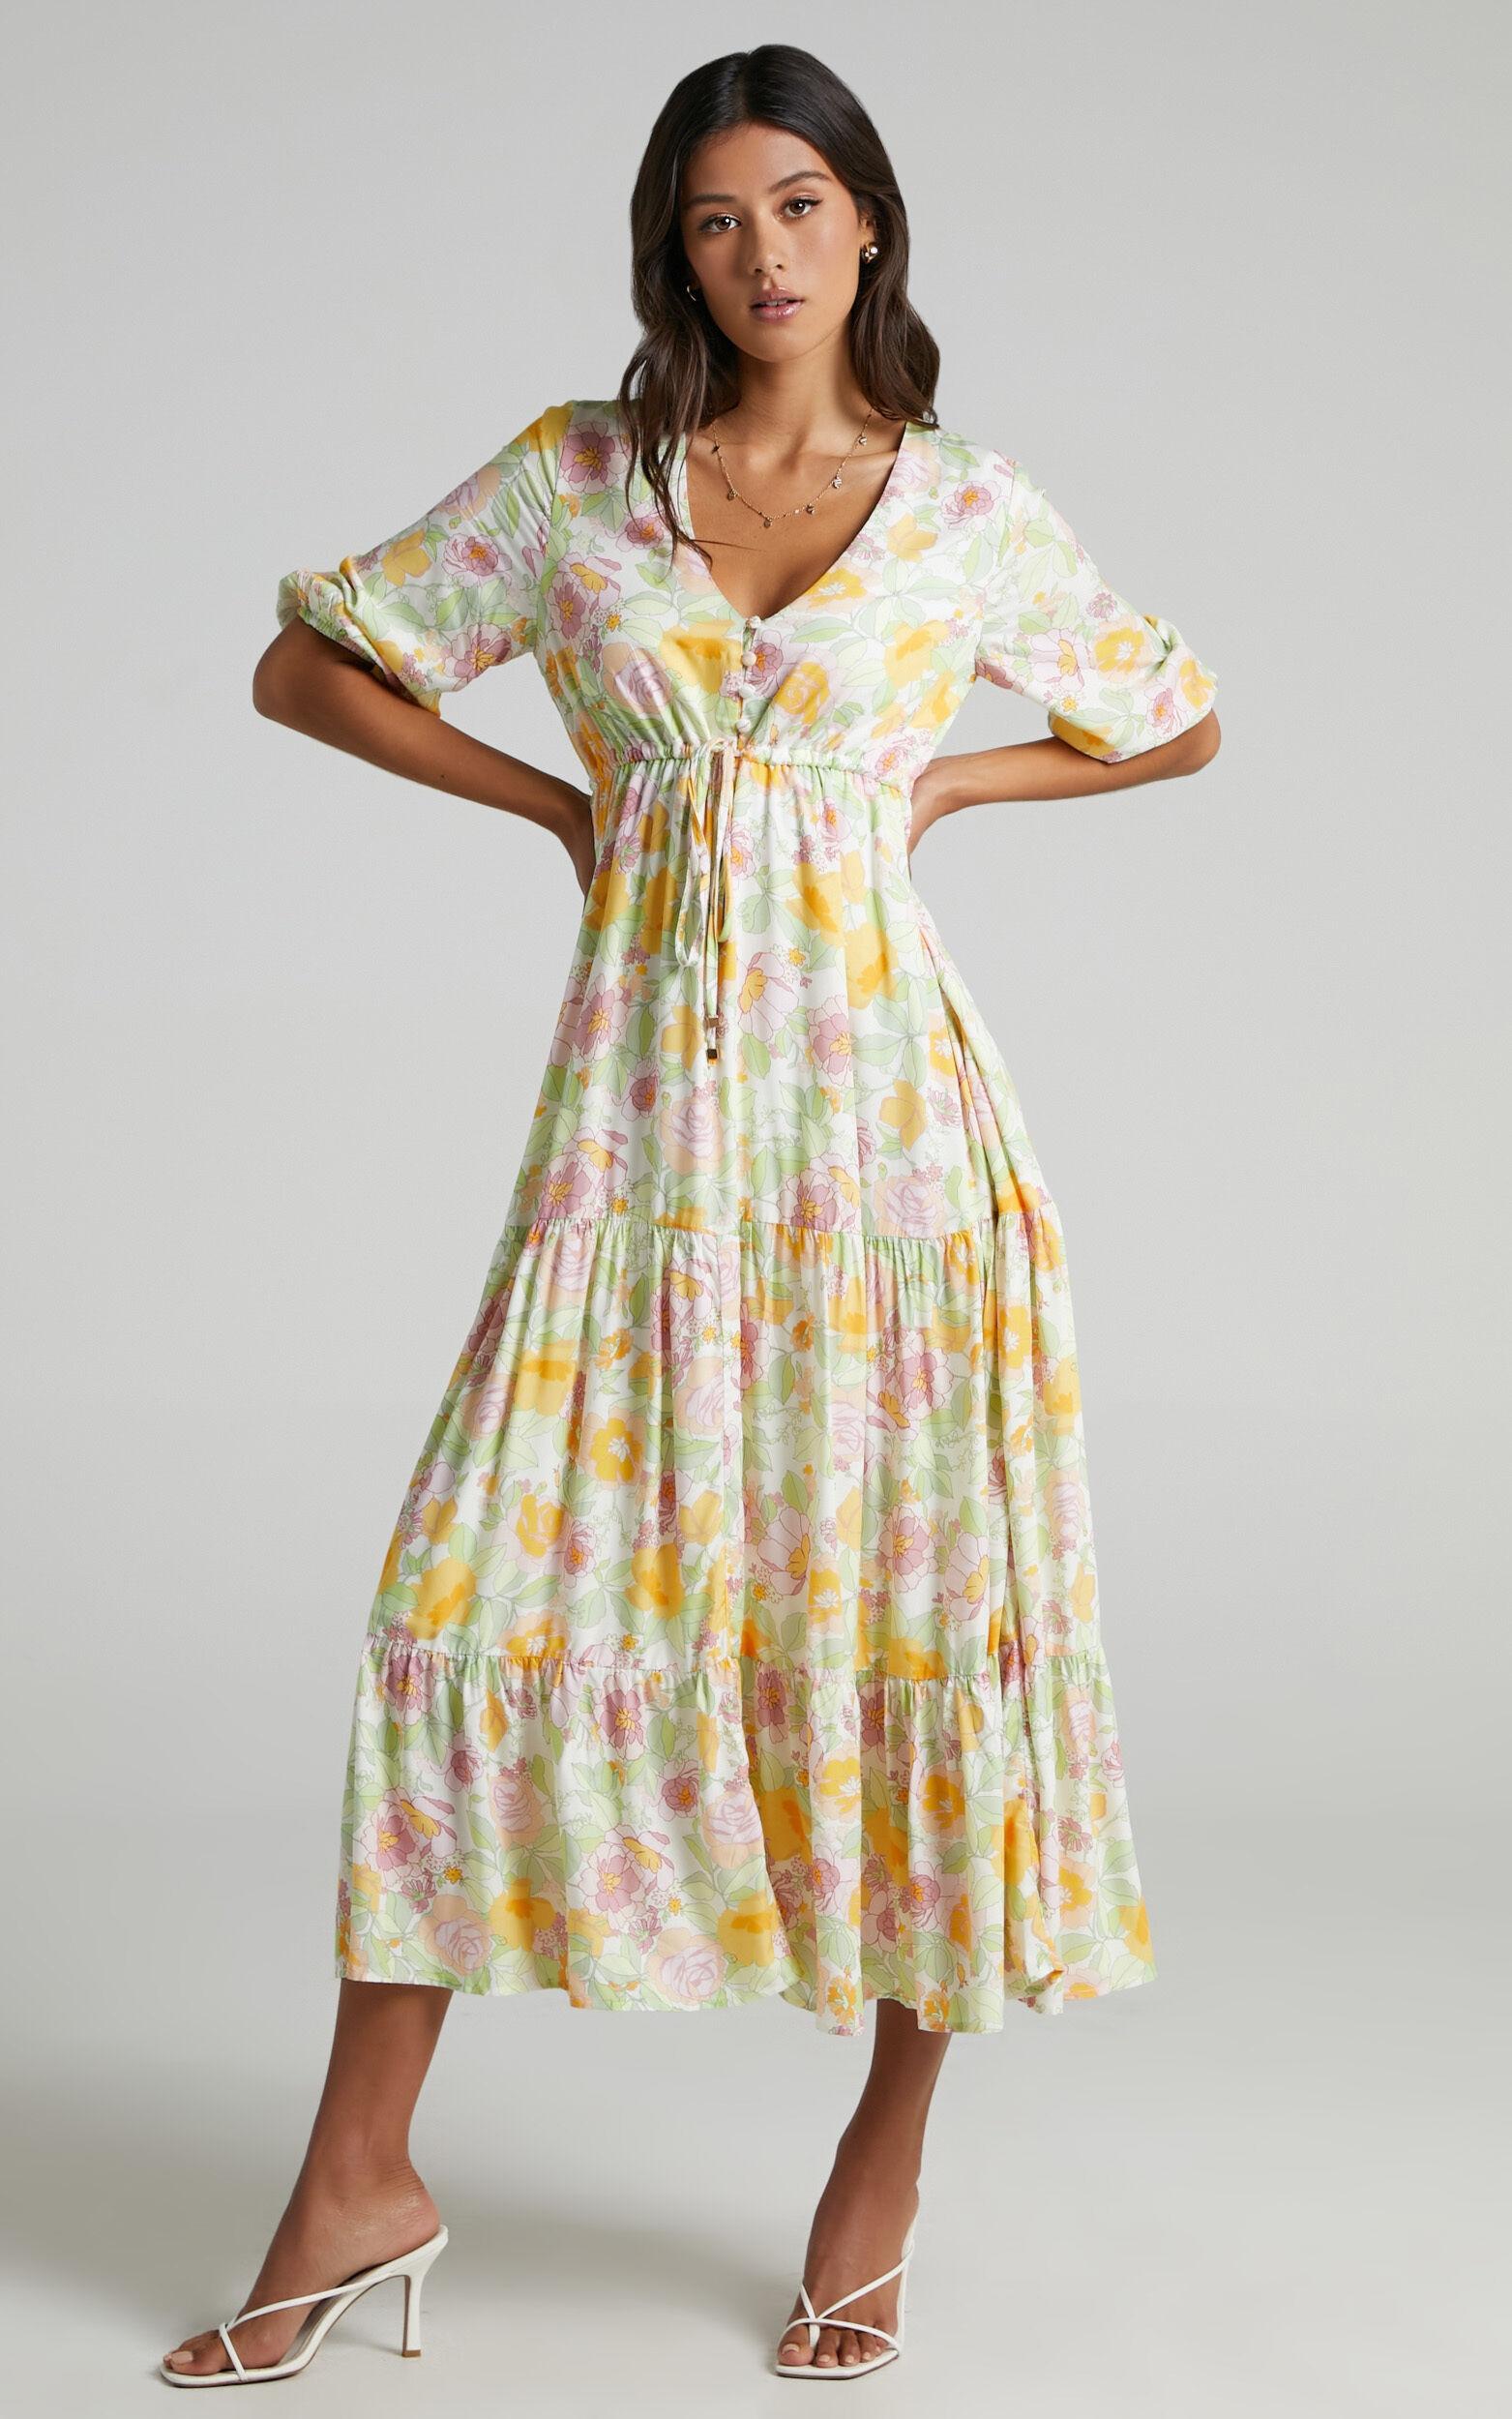 Lilibelle Dress in Linear Floral - 06, WHT2, super-hi-res image number null